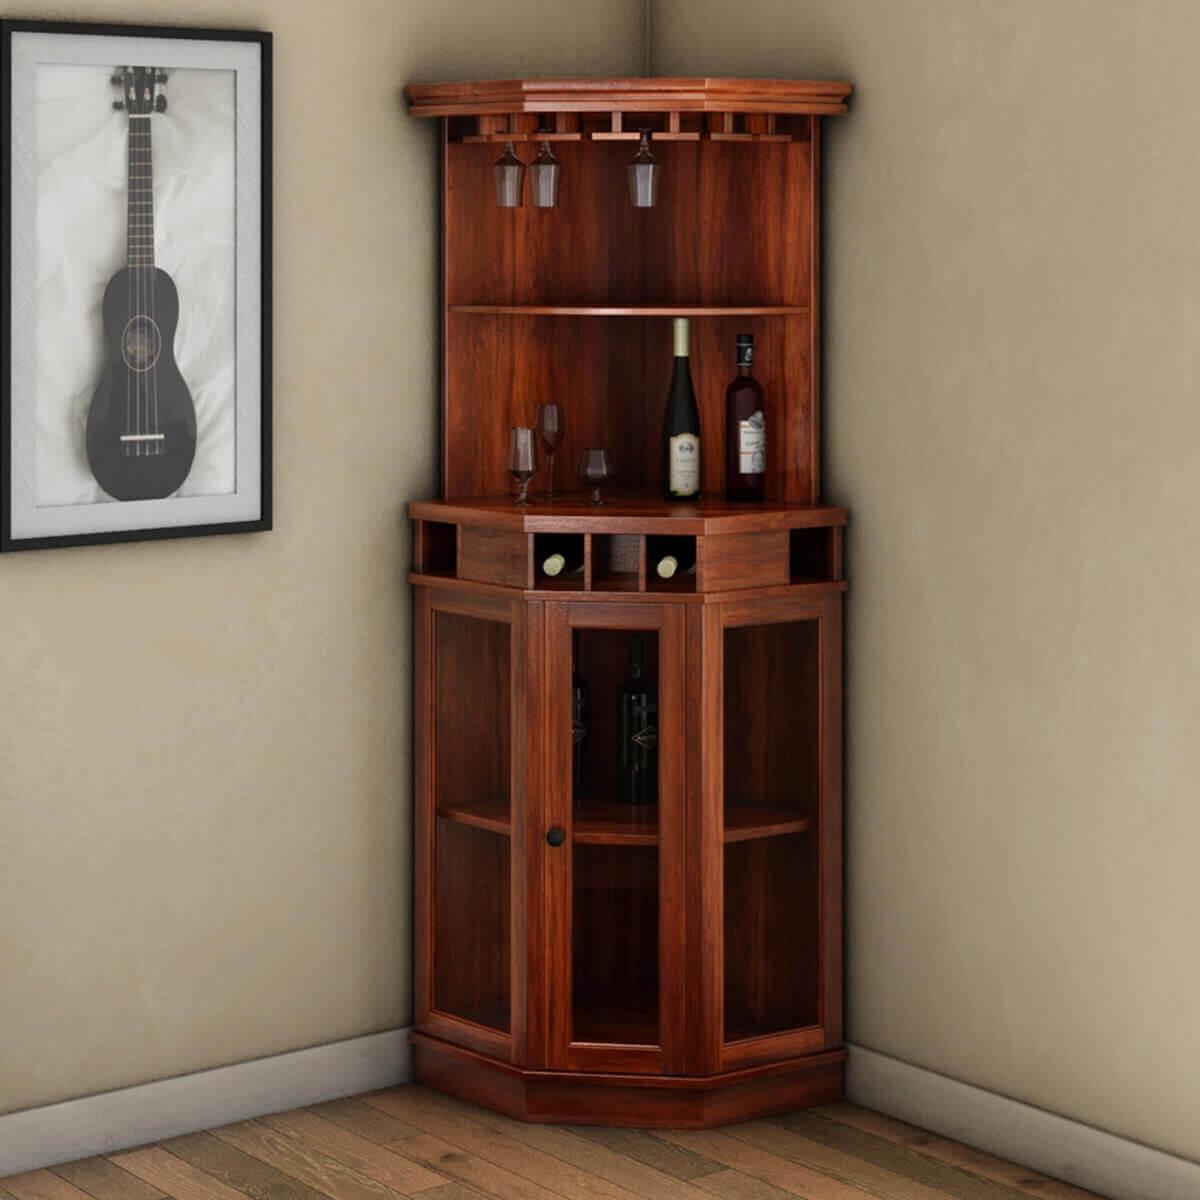 Solid Wood Corner Liquor Cabinet With Glass Doors with regard to measurements 1200 X 1200